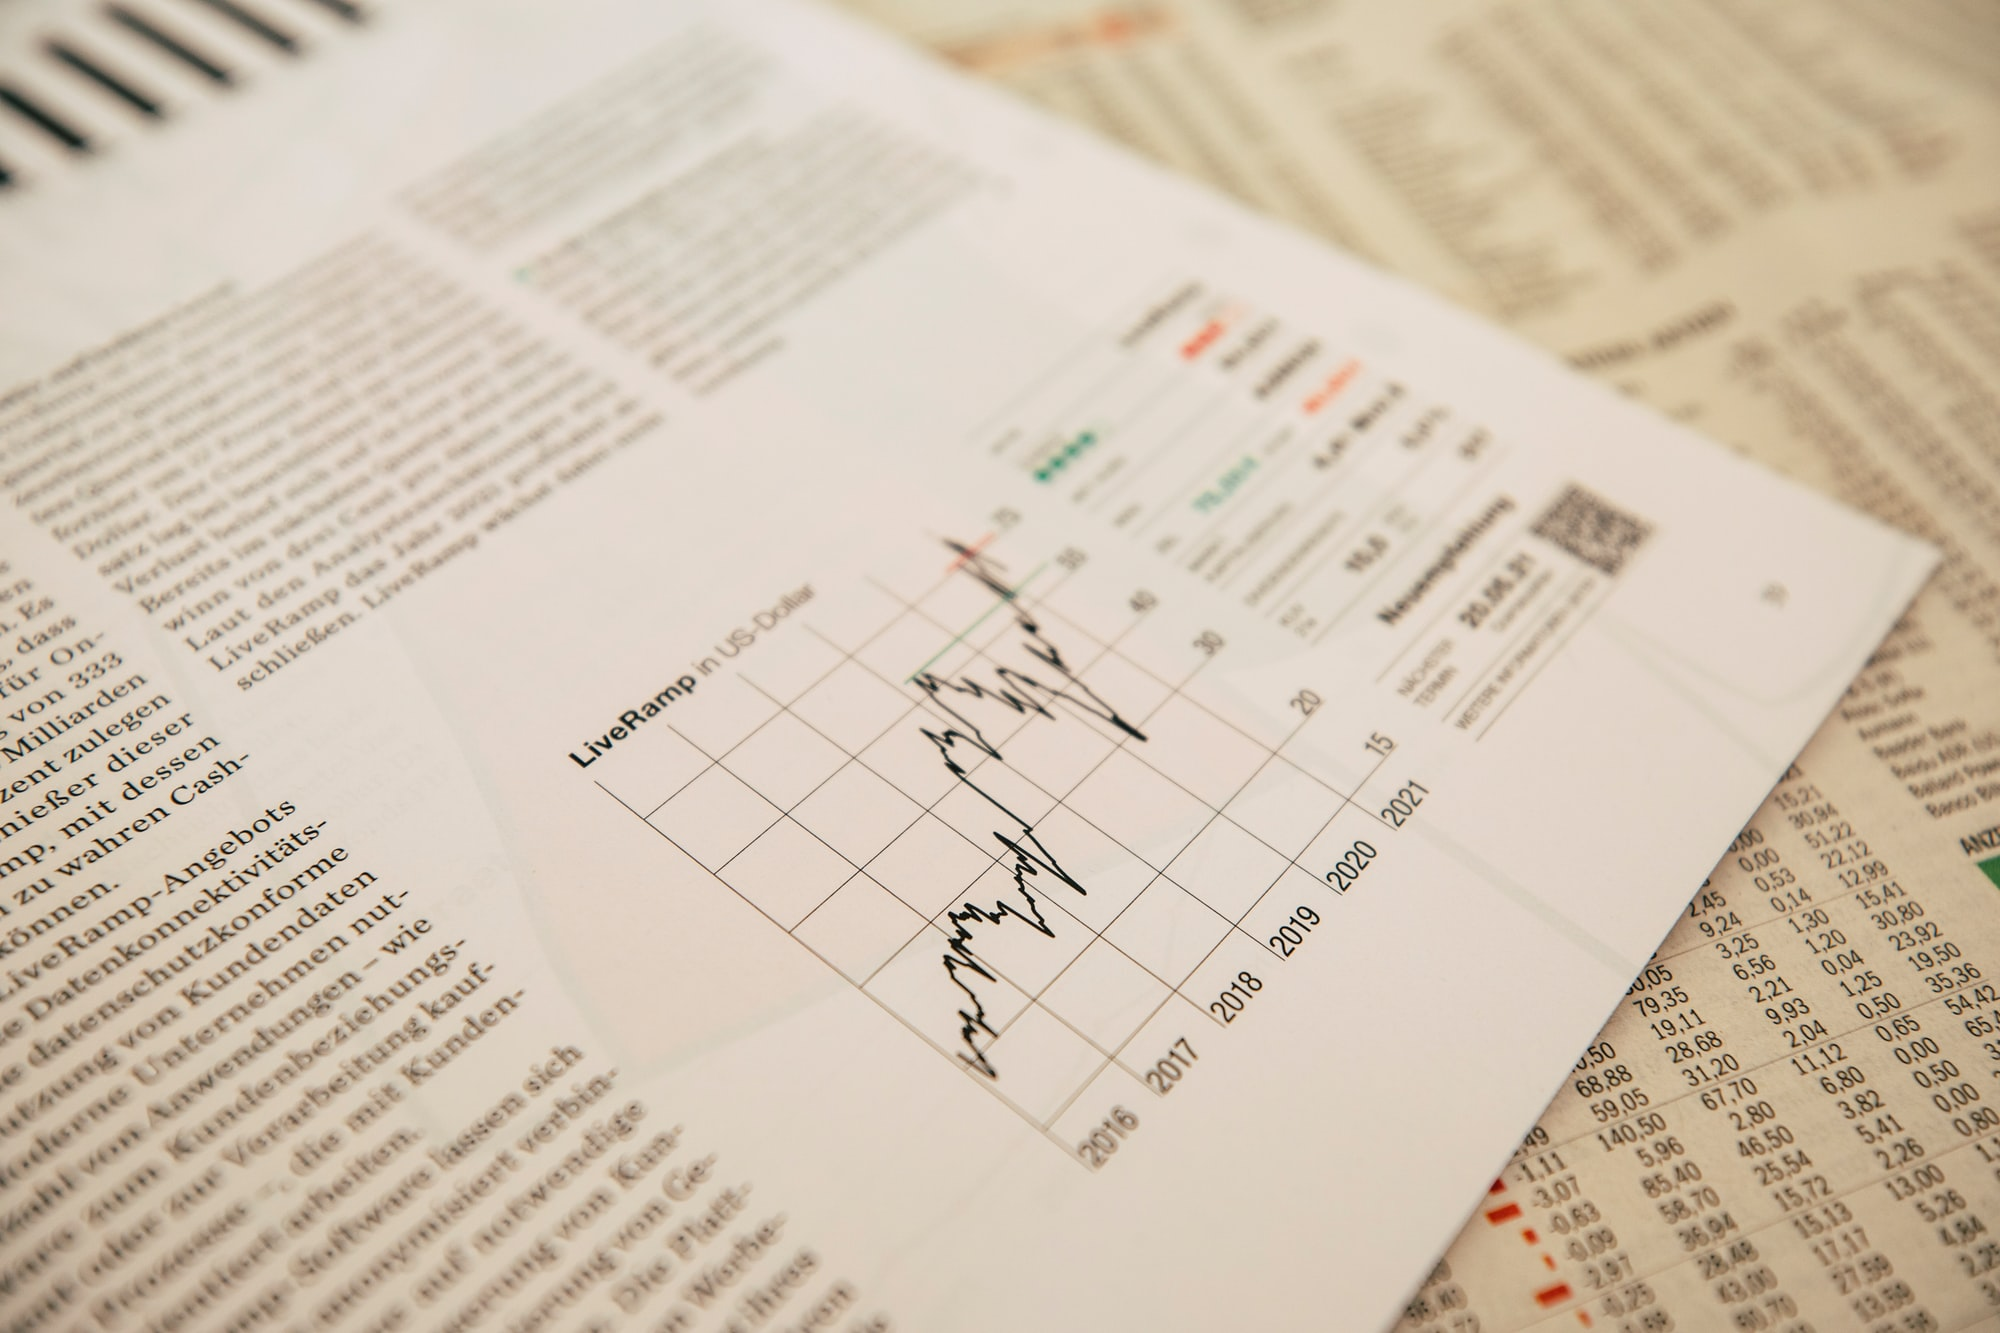 Daily newspaper economy stock market chart